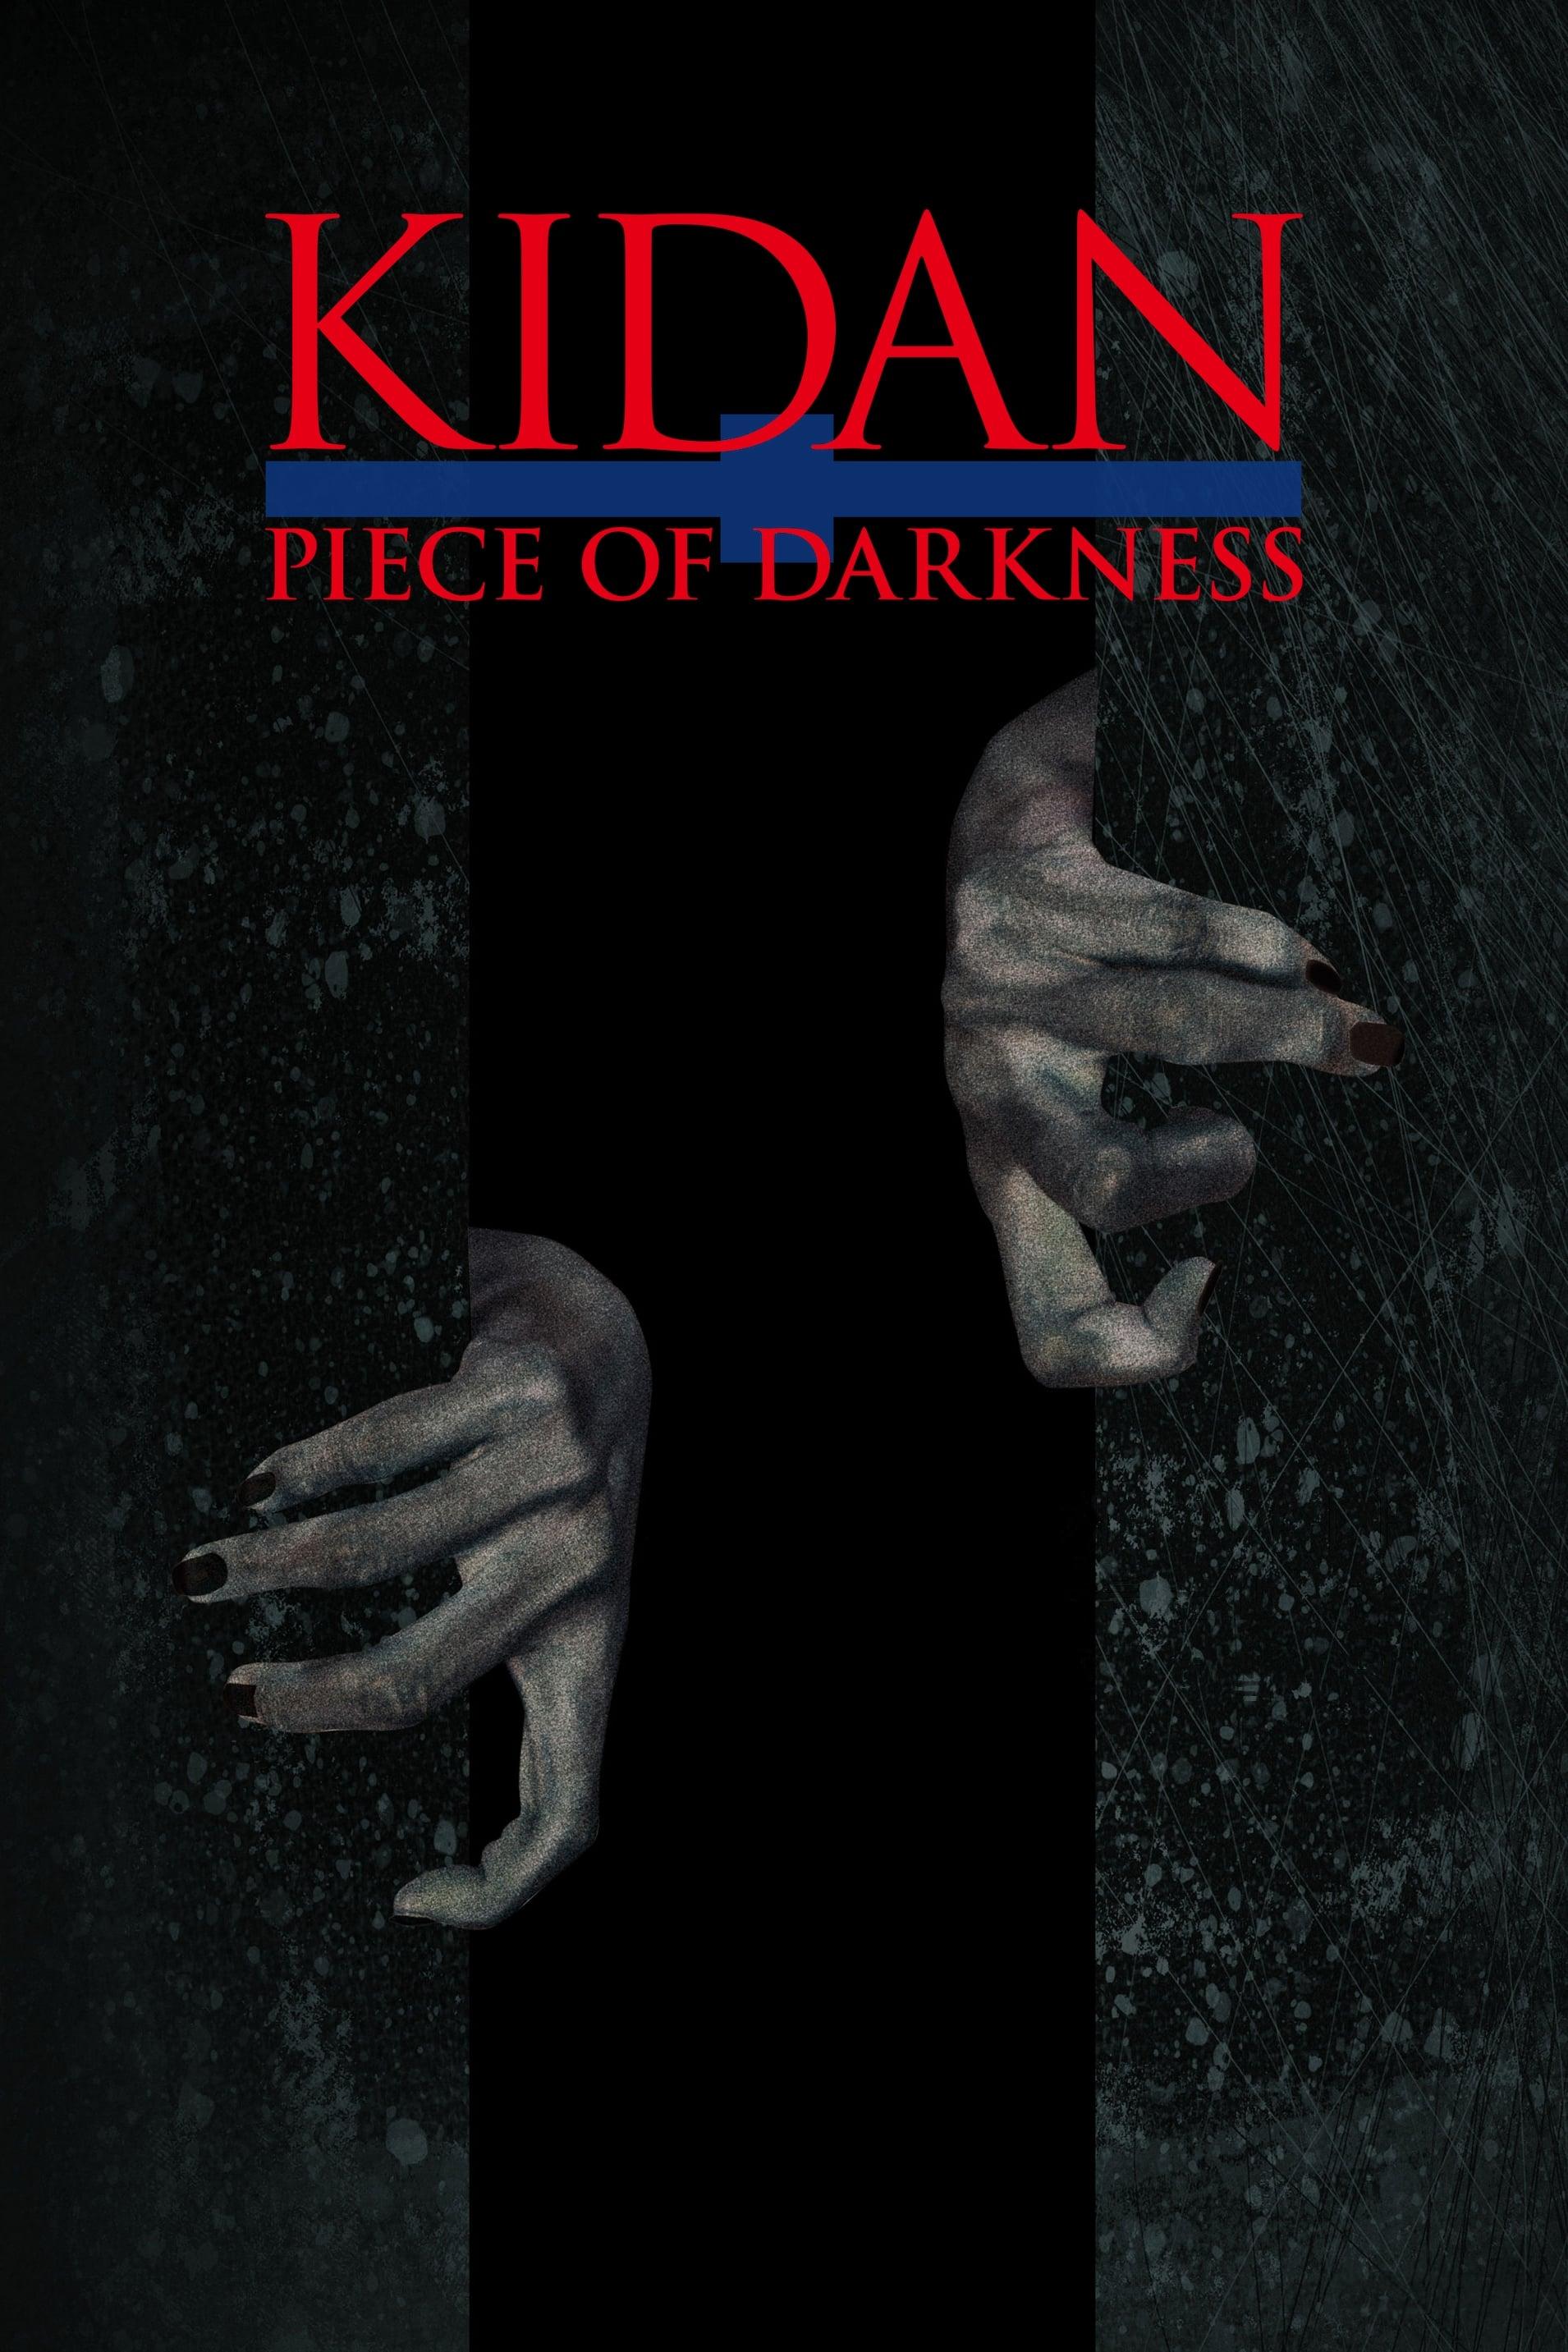 Kidan Piece of Darkness